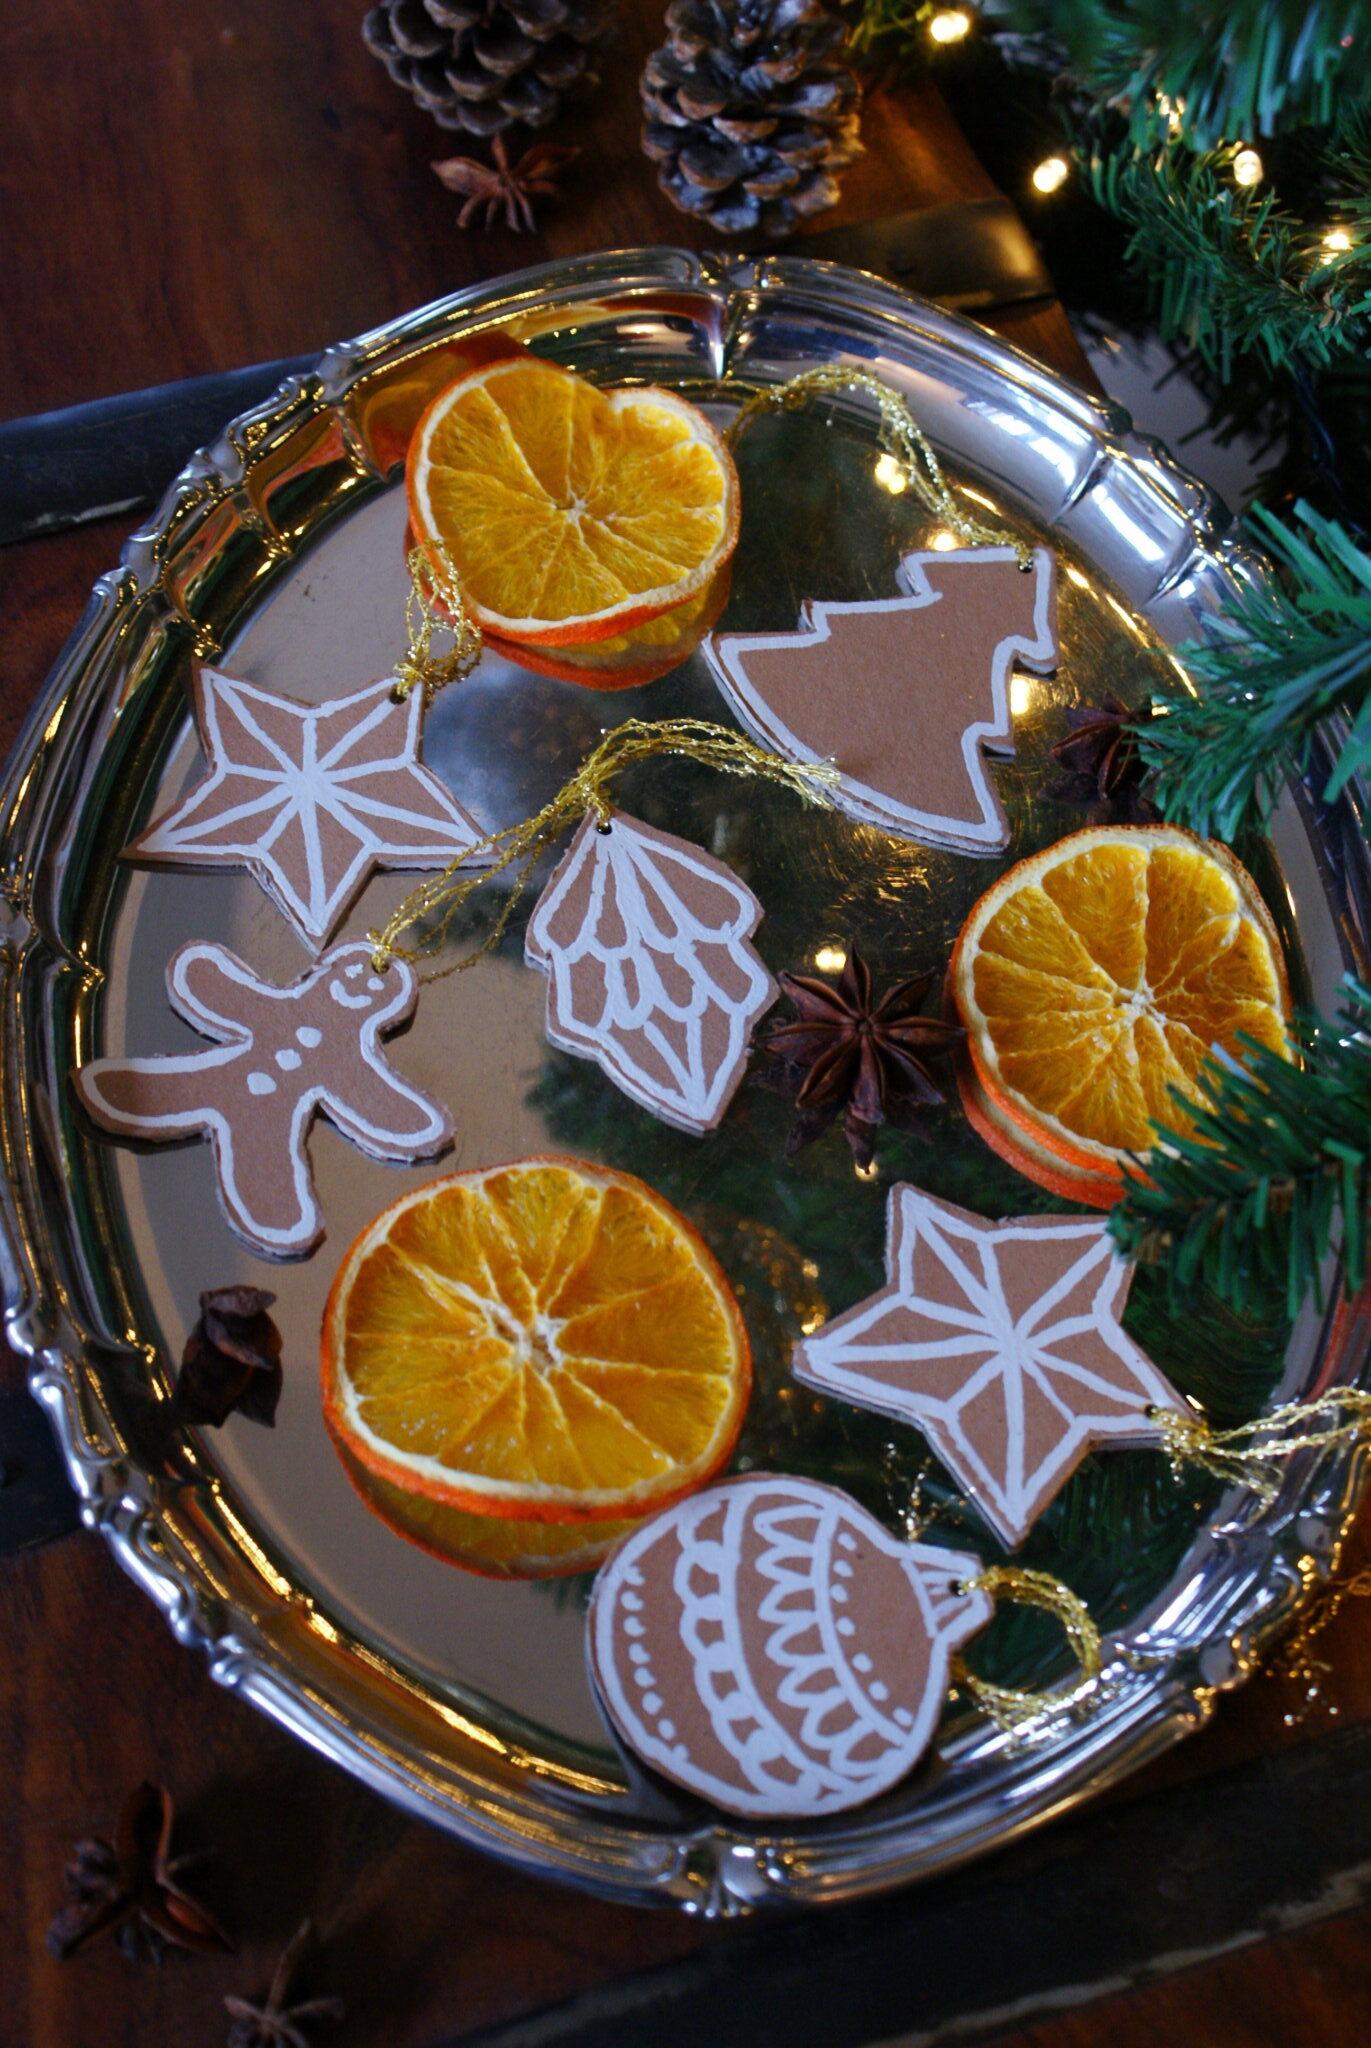 diy cardboard gingerbread cookies christmas tree ornaments idea easy last minute francinesplaceblog tutorial craft